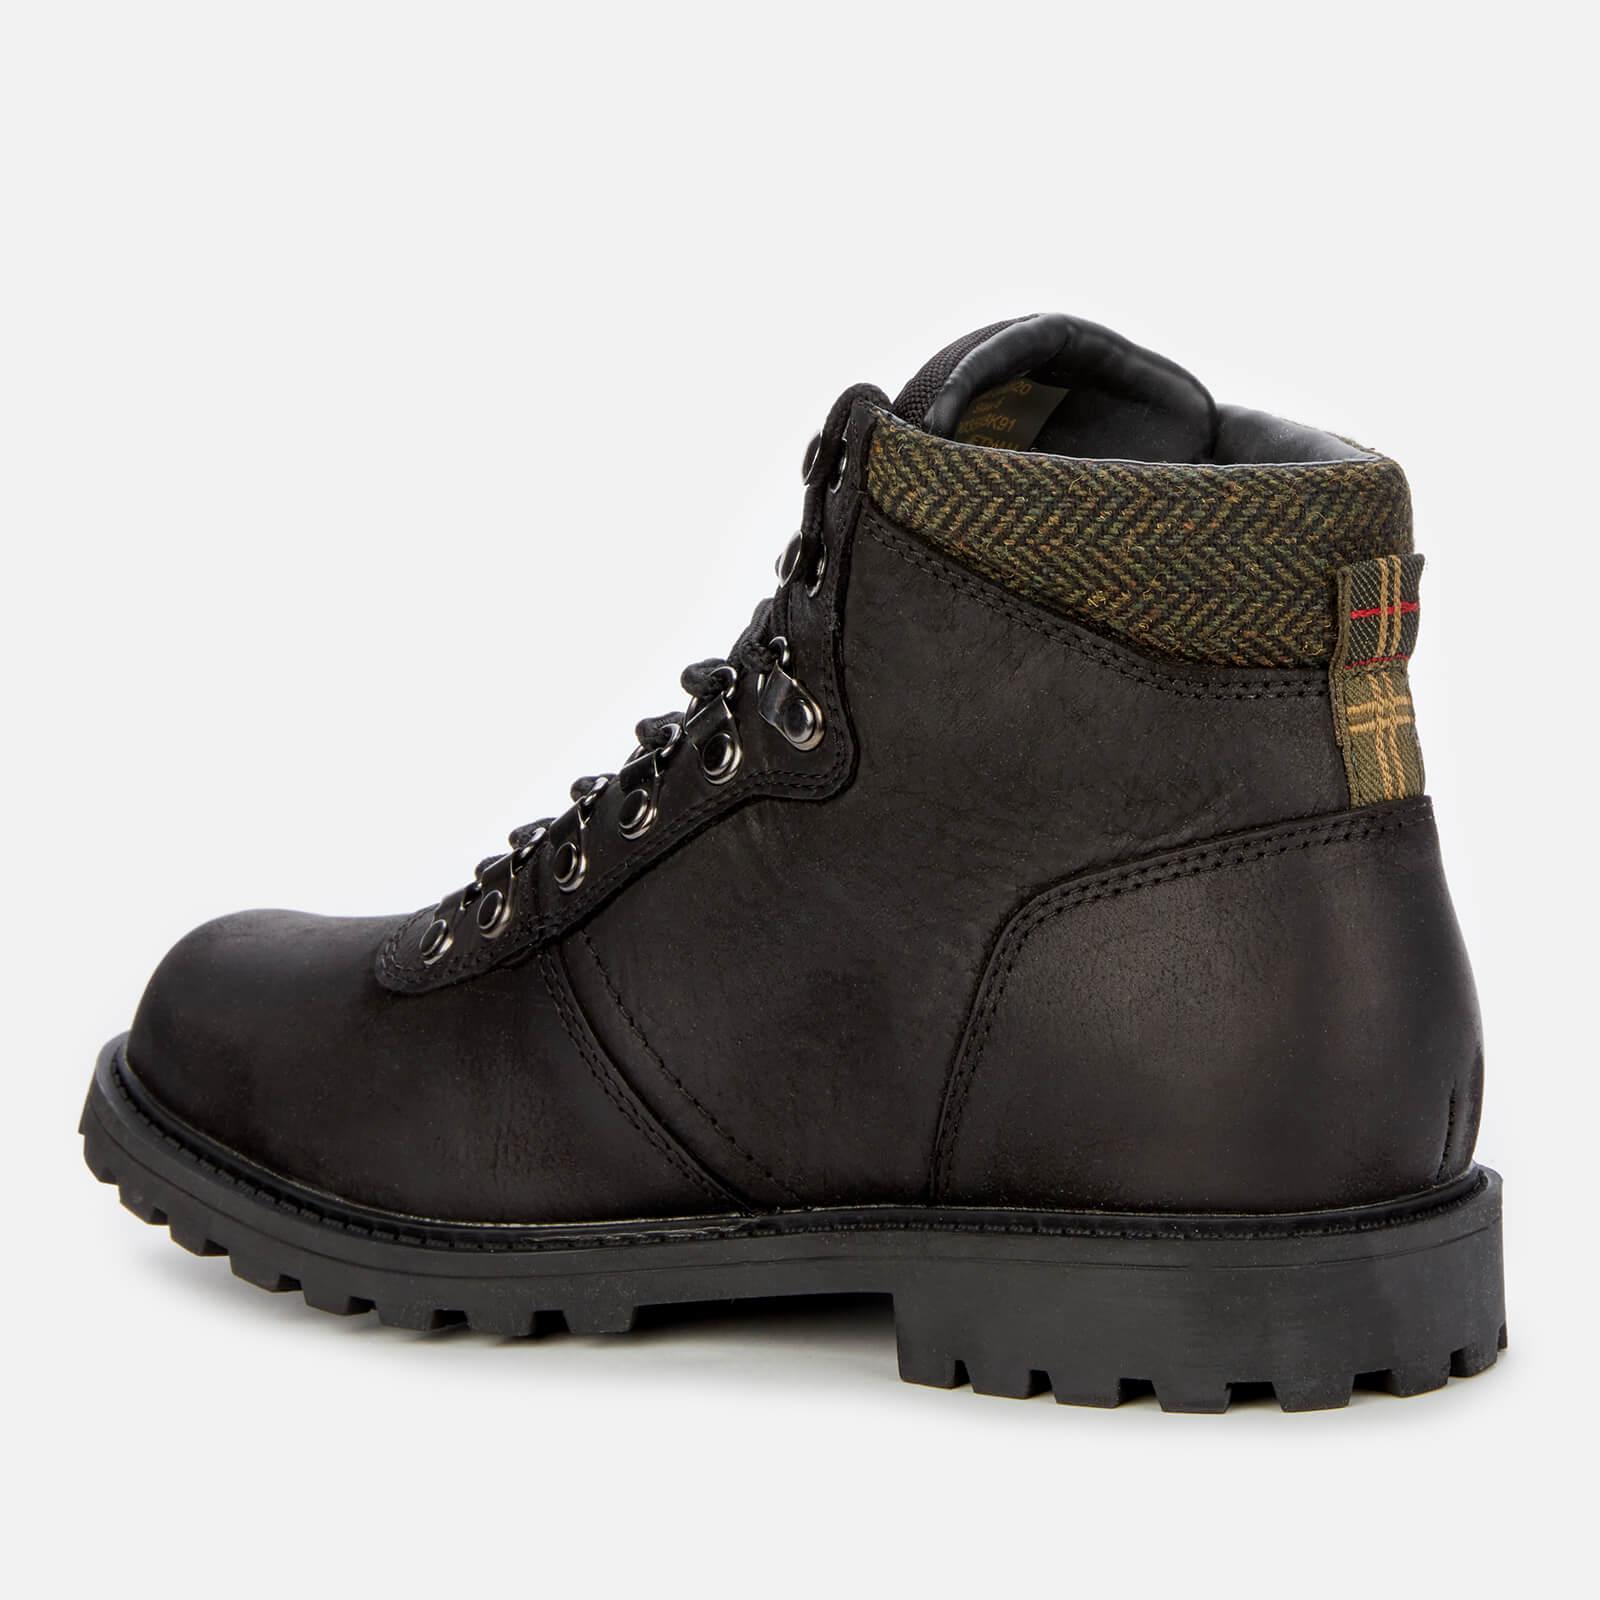 Barbour Women's Elsdon Hiker Style Ankle Boots - Black - Uk 3